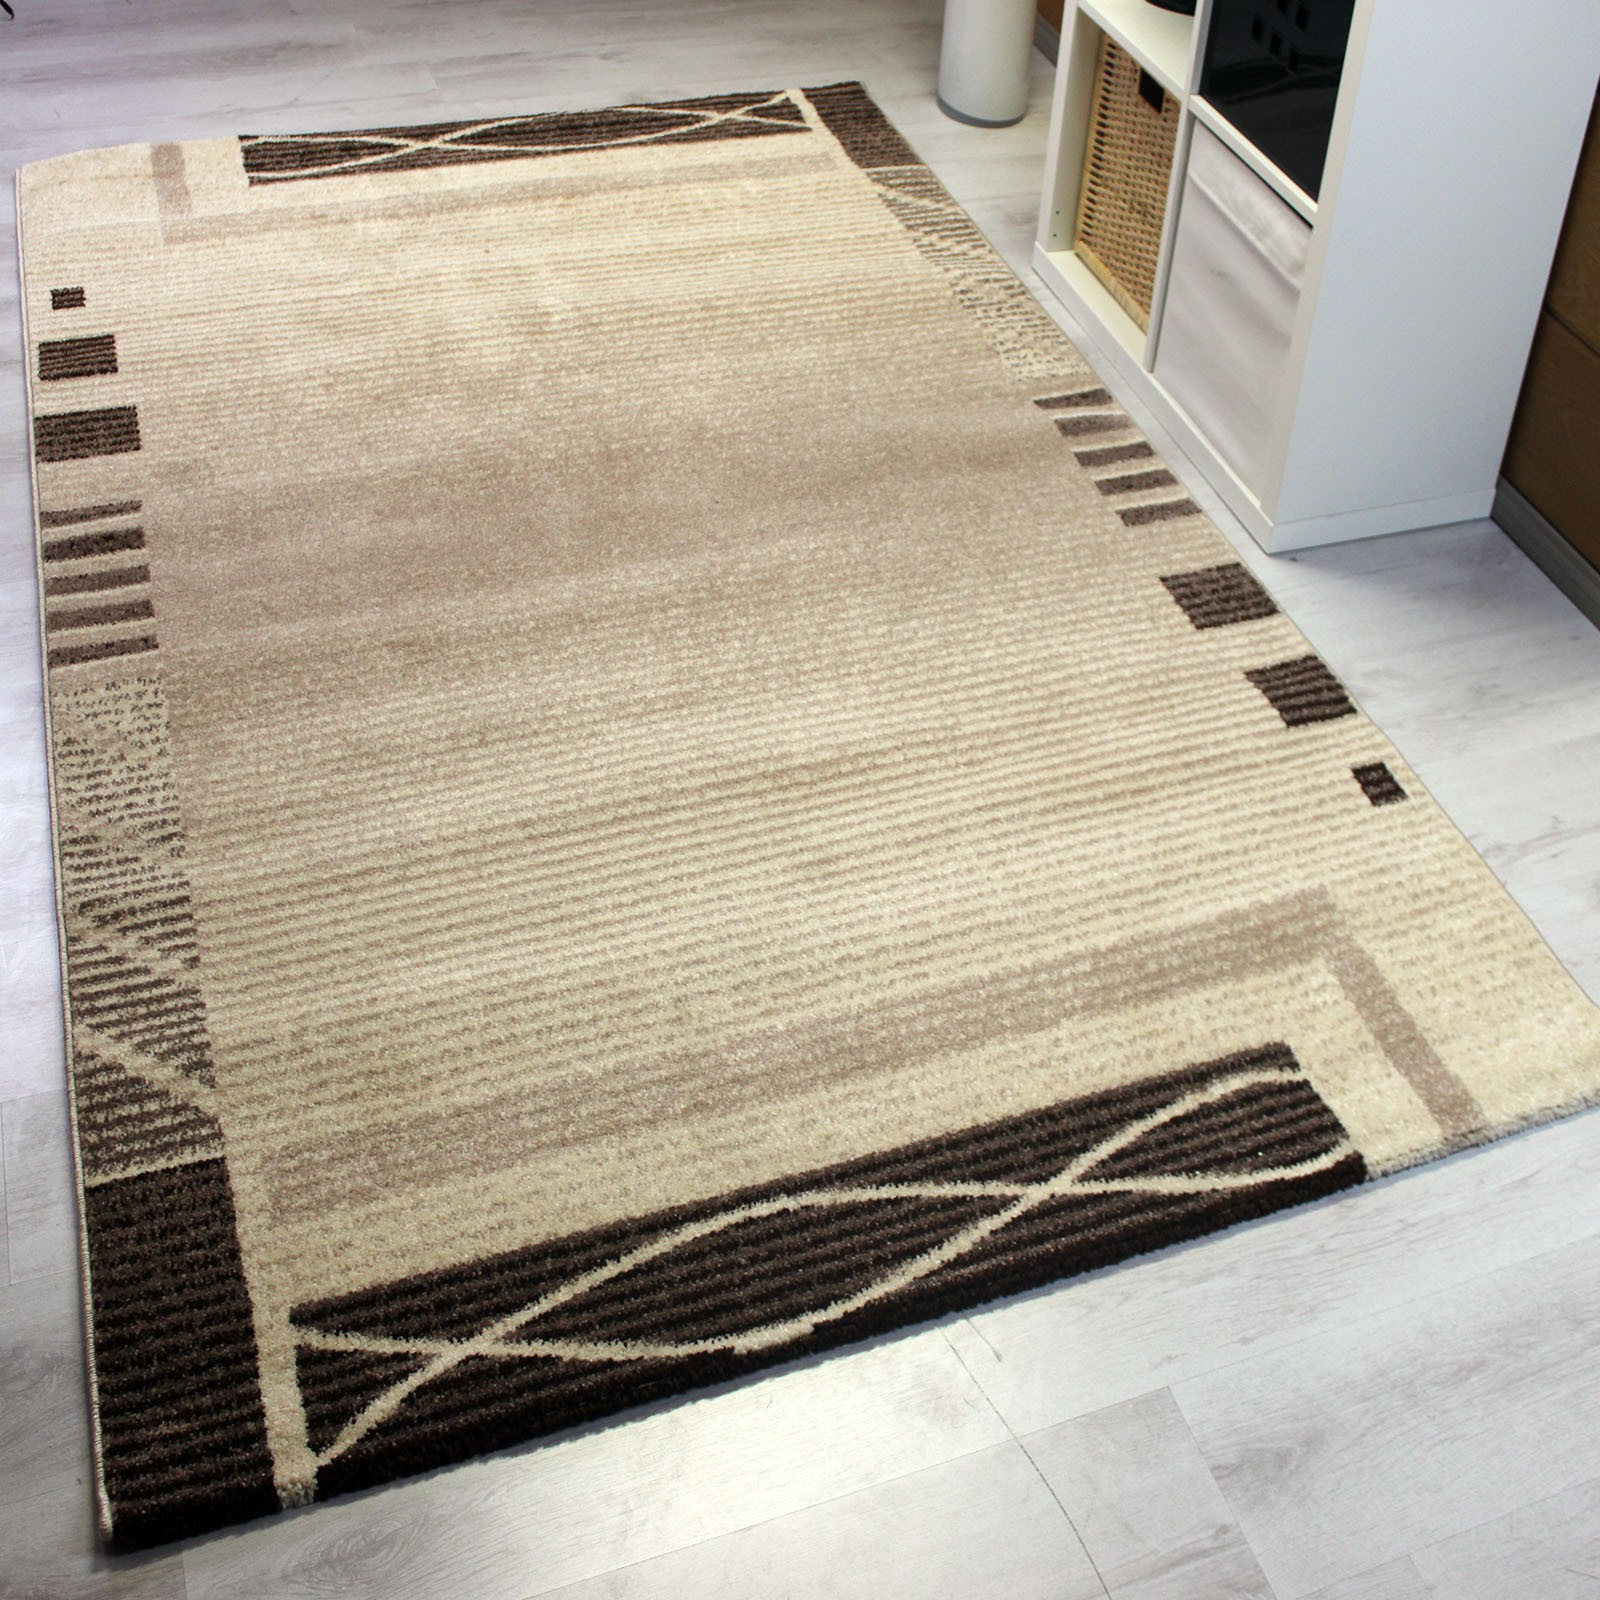 frisee kurzflor teppich mit umrandung modern in beige. Black Bedroom Furniture Sets. Home Design Ideas